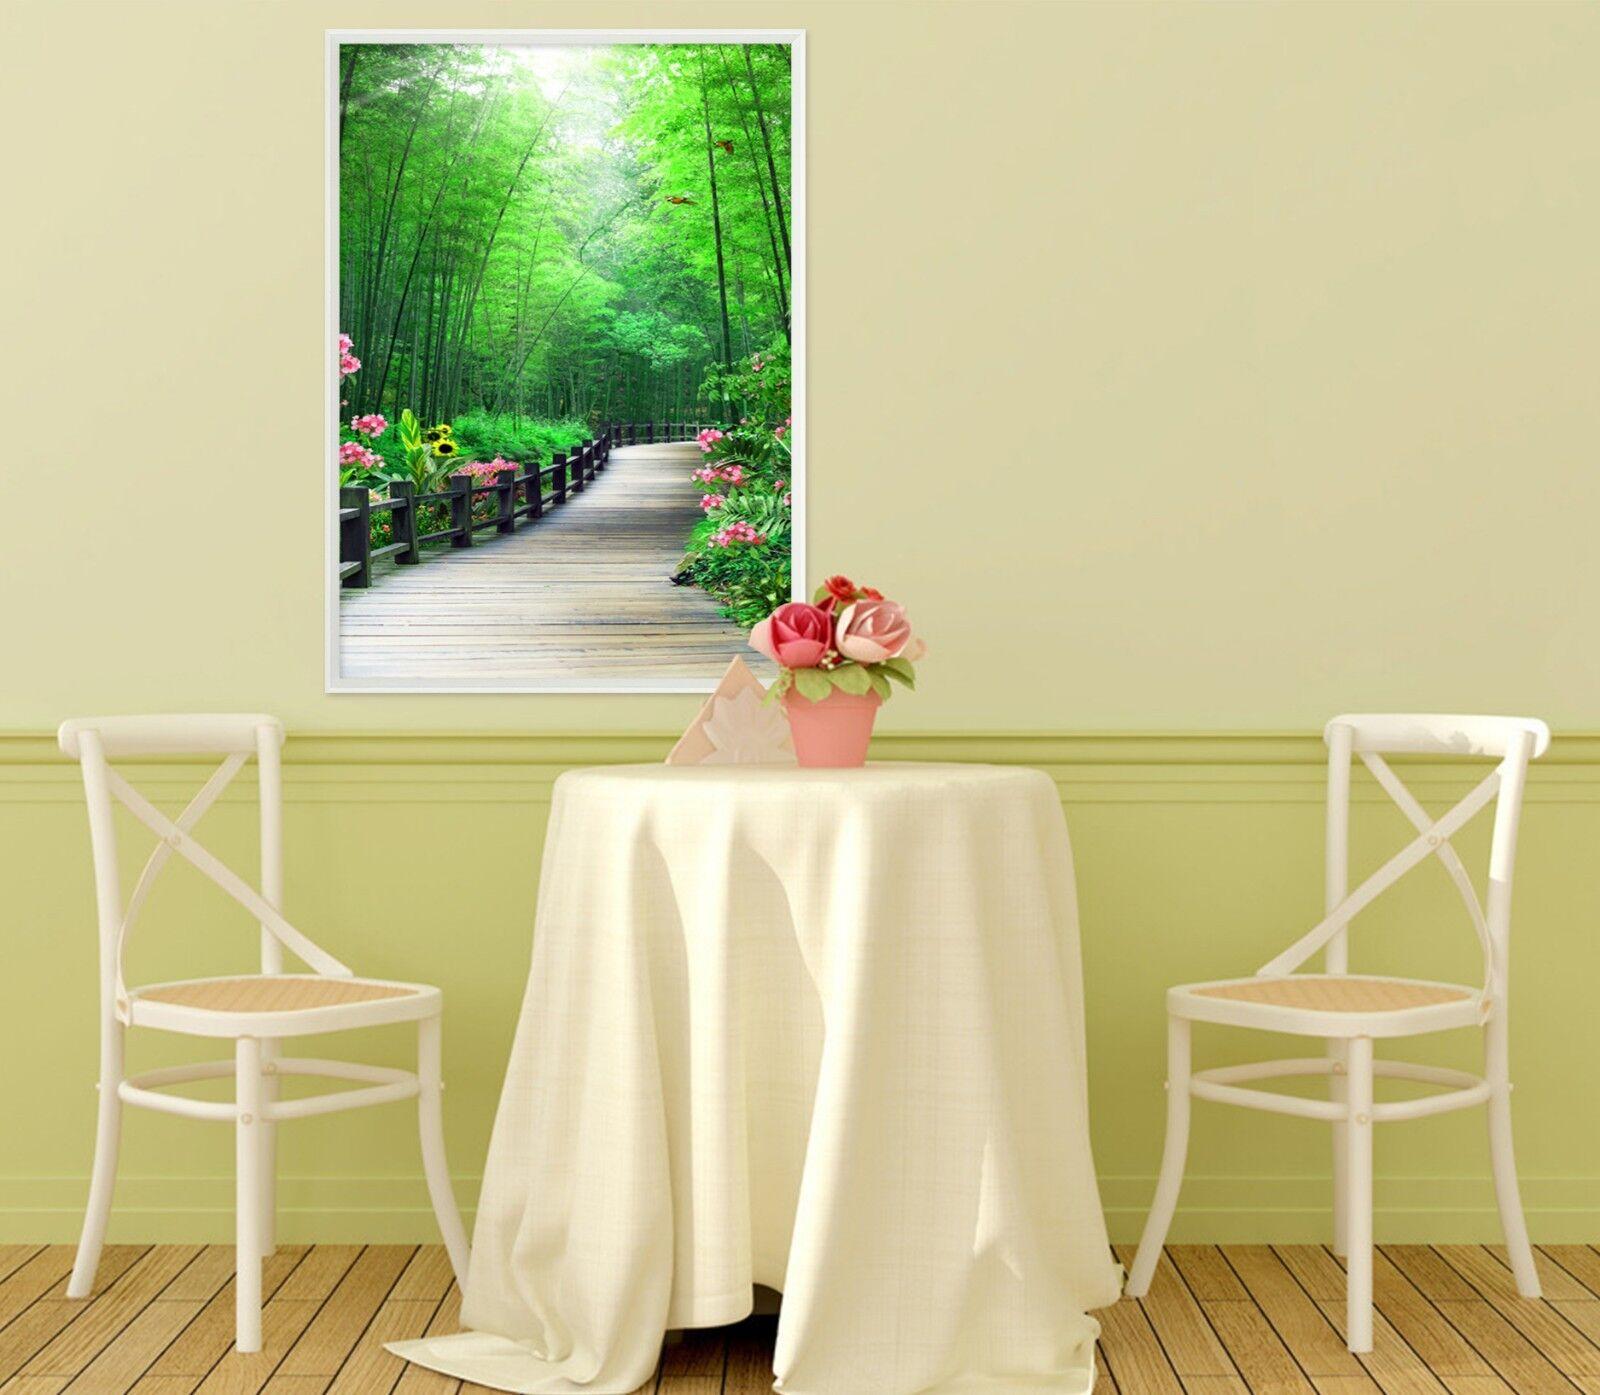 3D Bamboo Forest Park 5 Framed Poster Home Decor Print Painting Art AJ UK